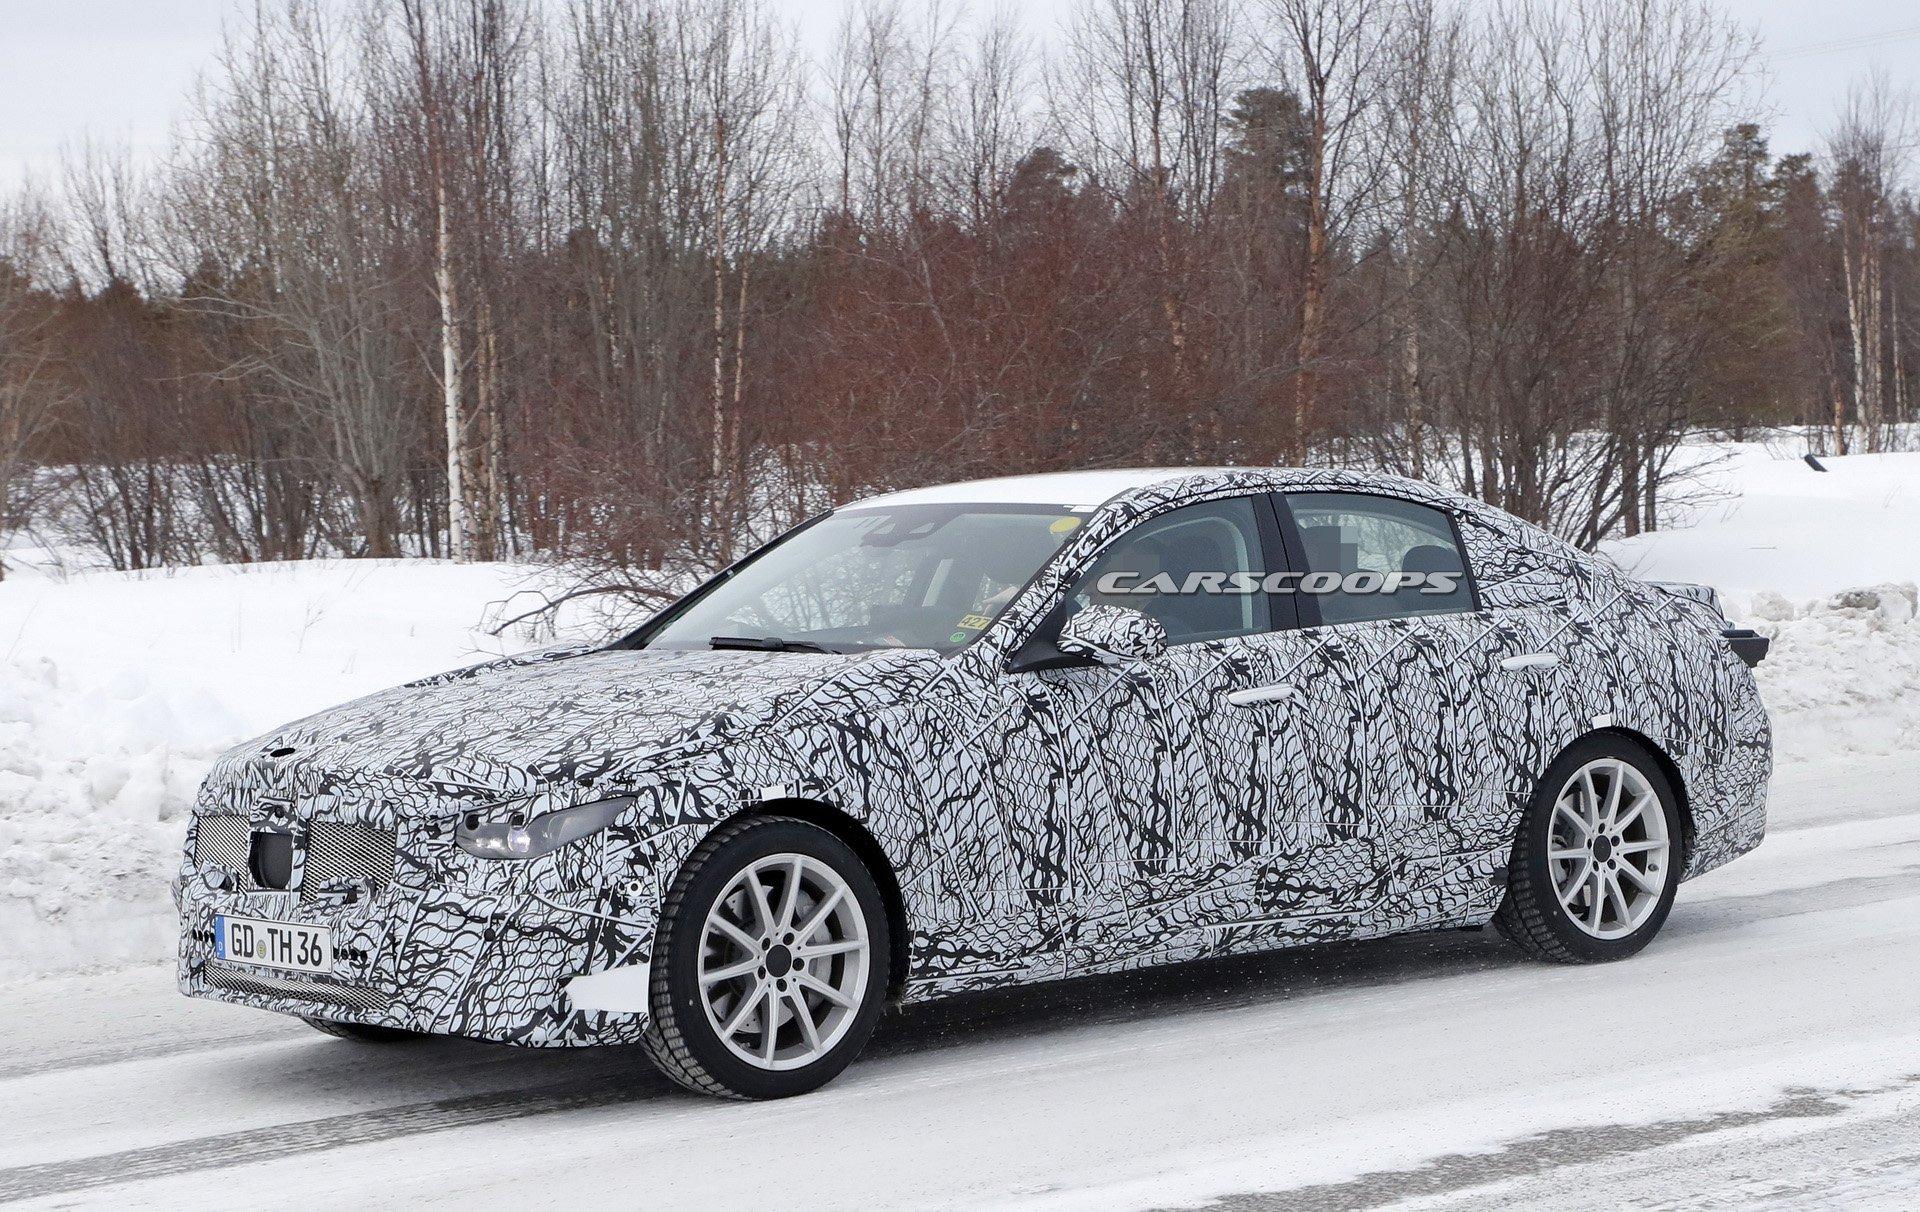 Nuova Mercedes Classe C ibrida plug-in foto spia